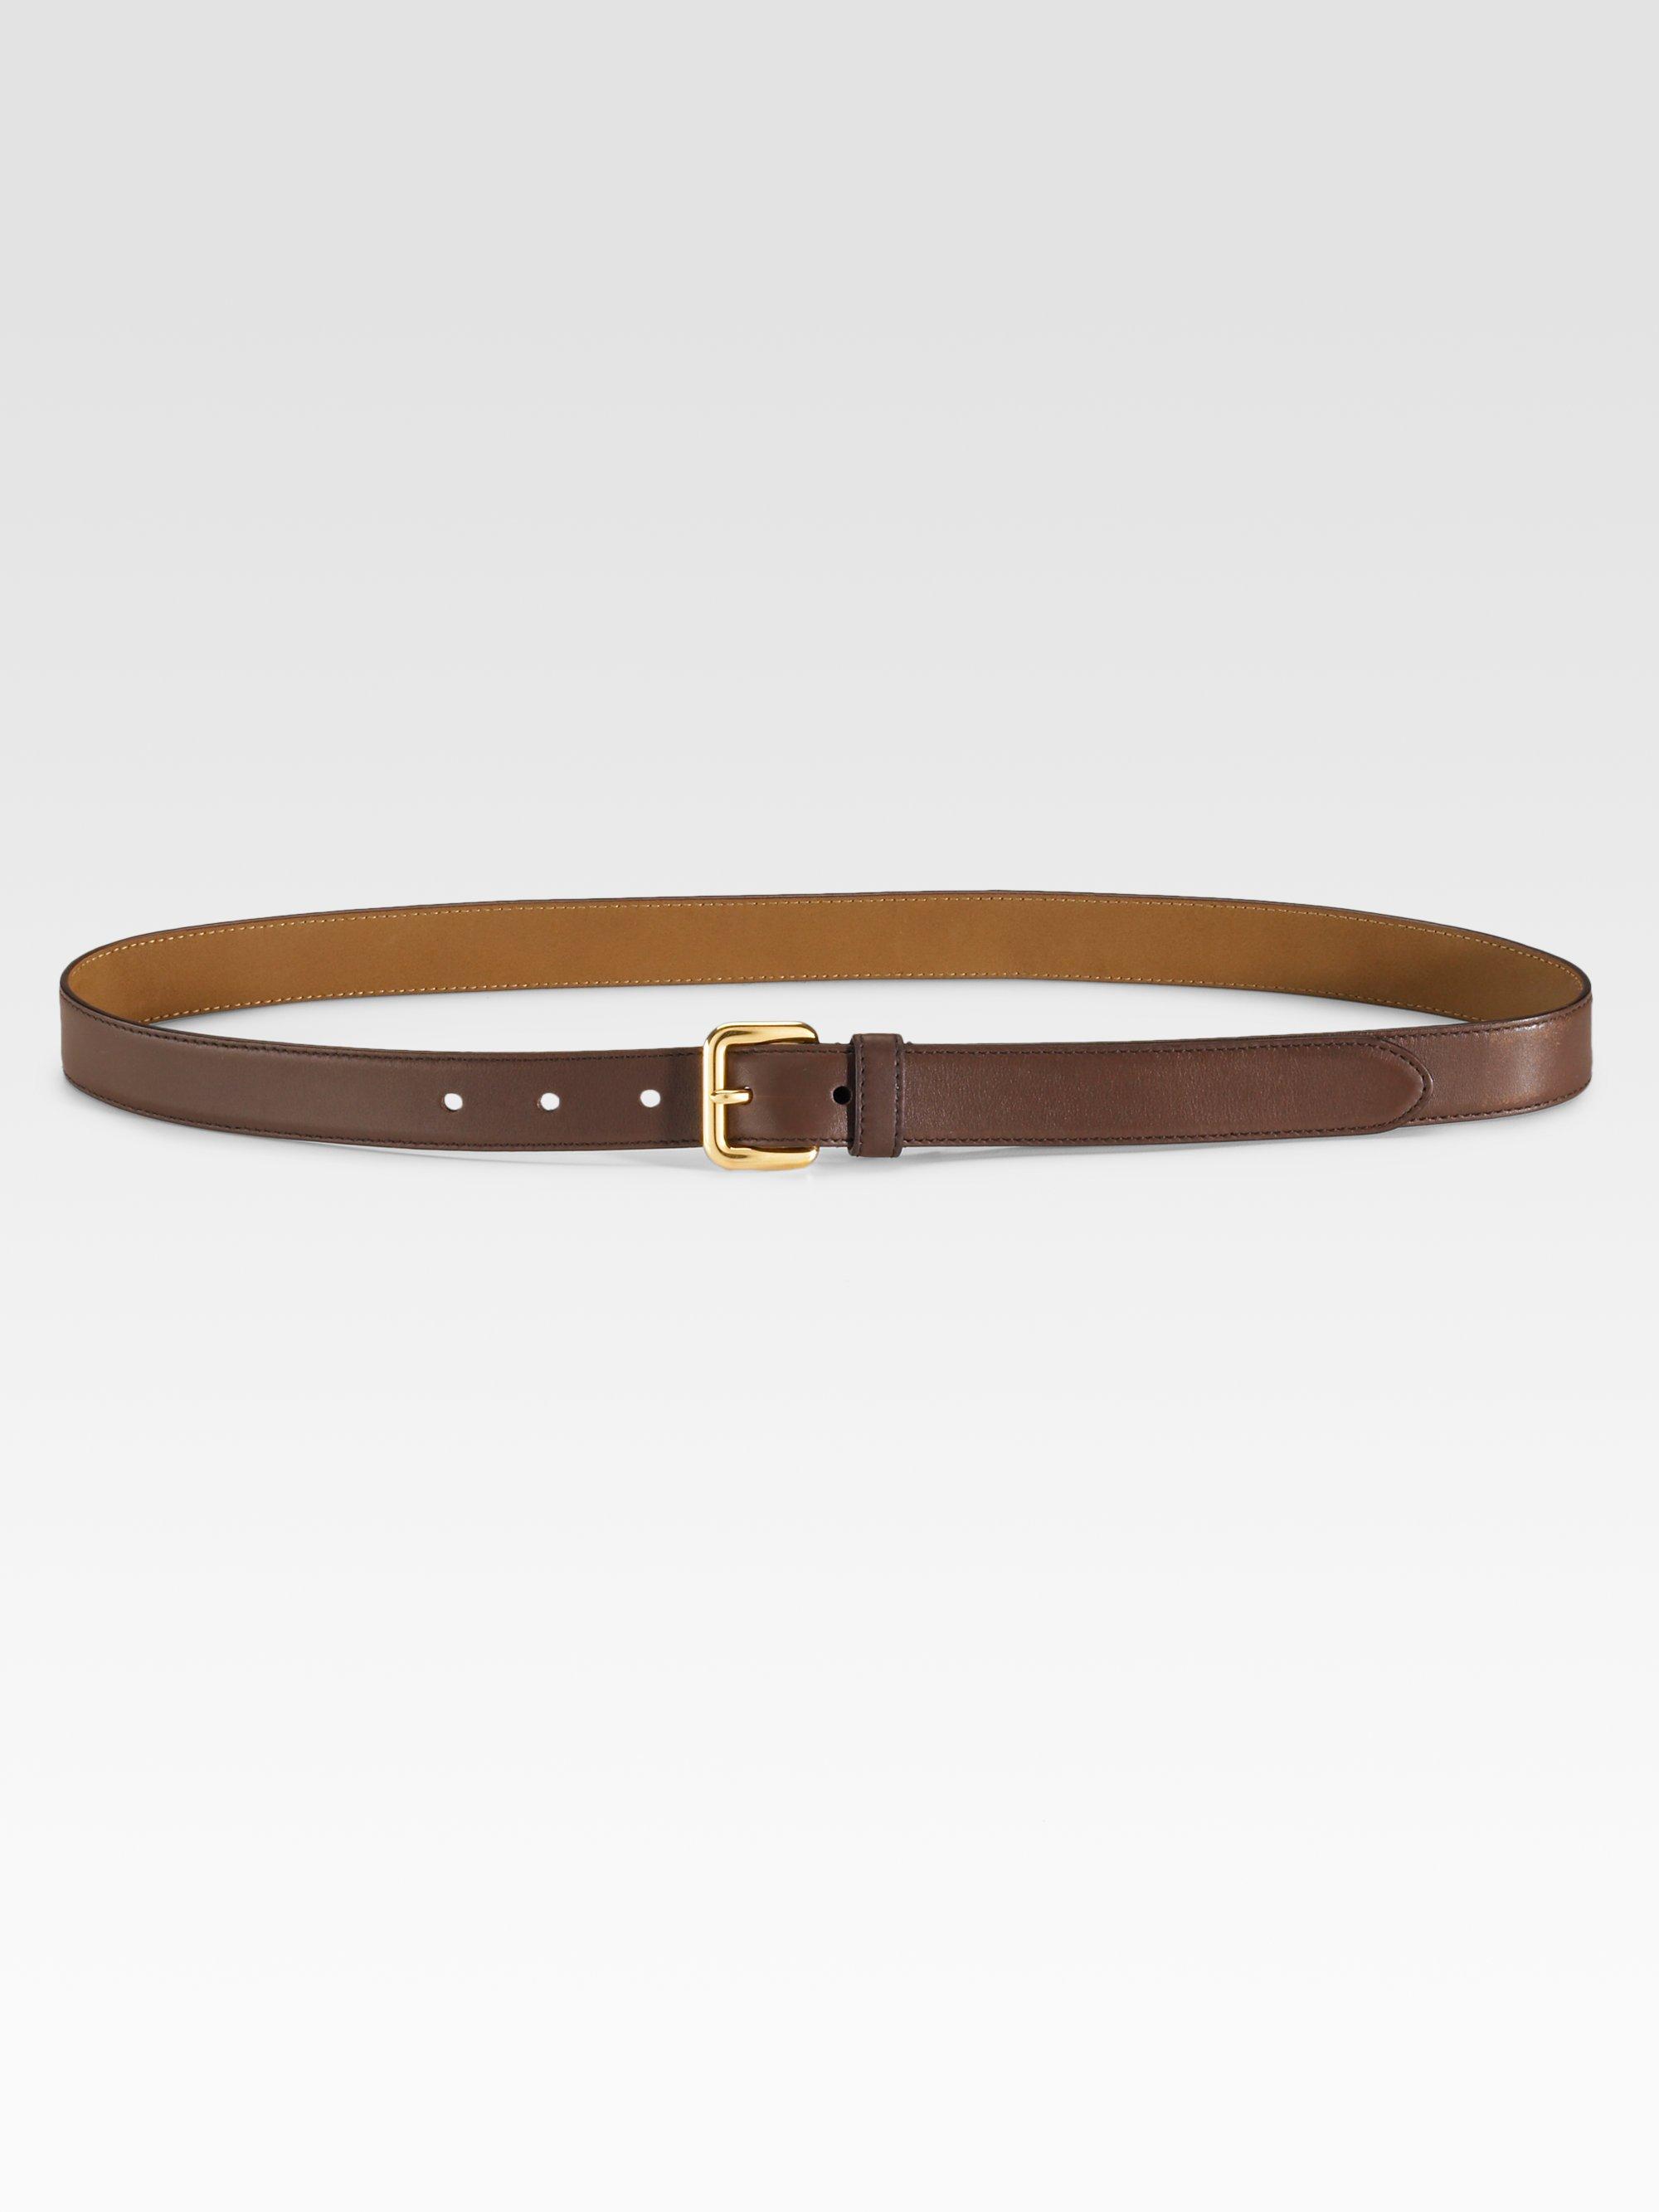 Prada Skinny Vitello Leather Belt in Brown | Lyst